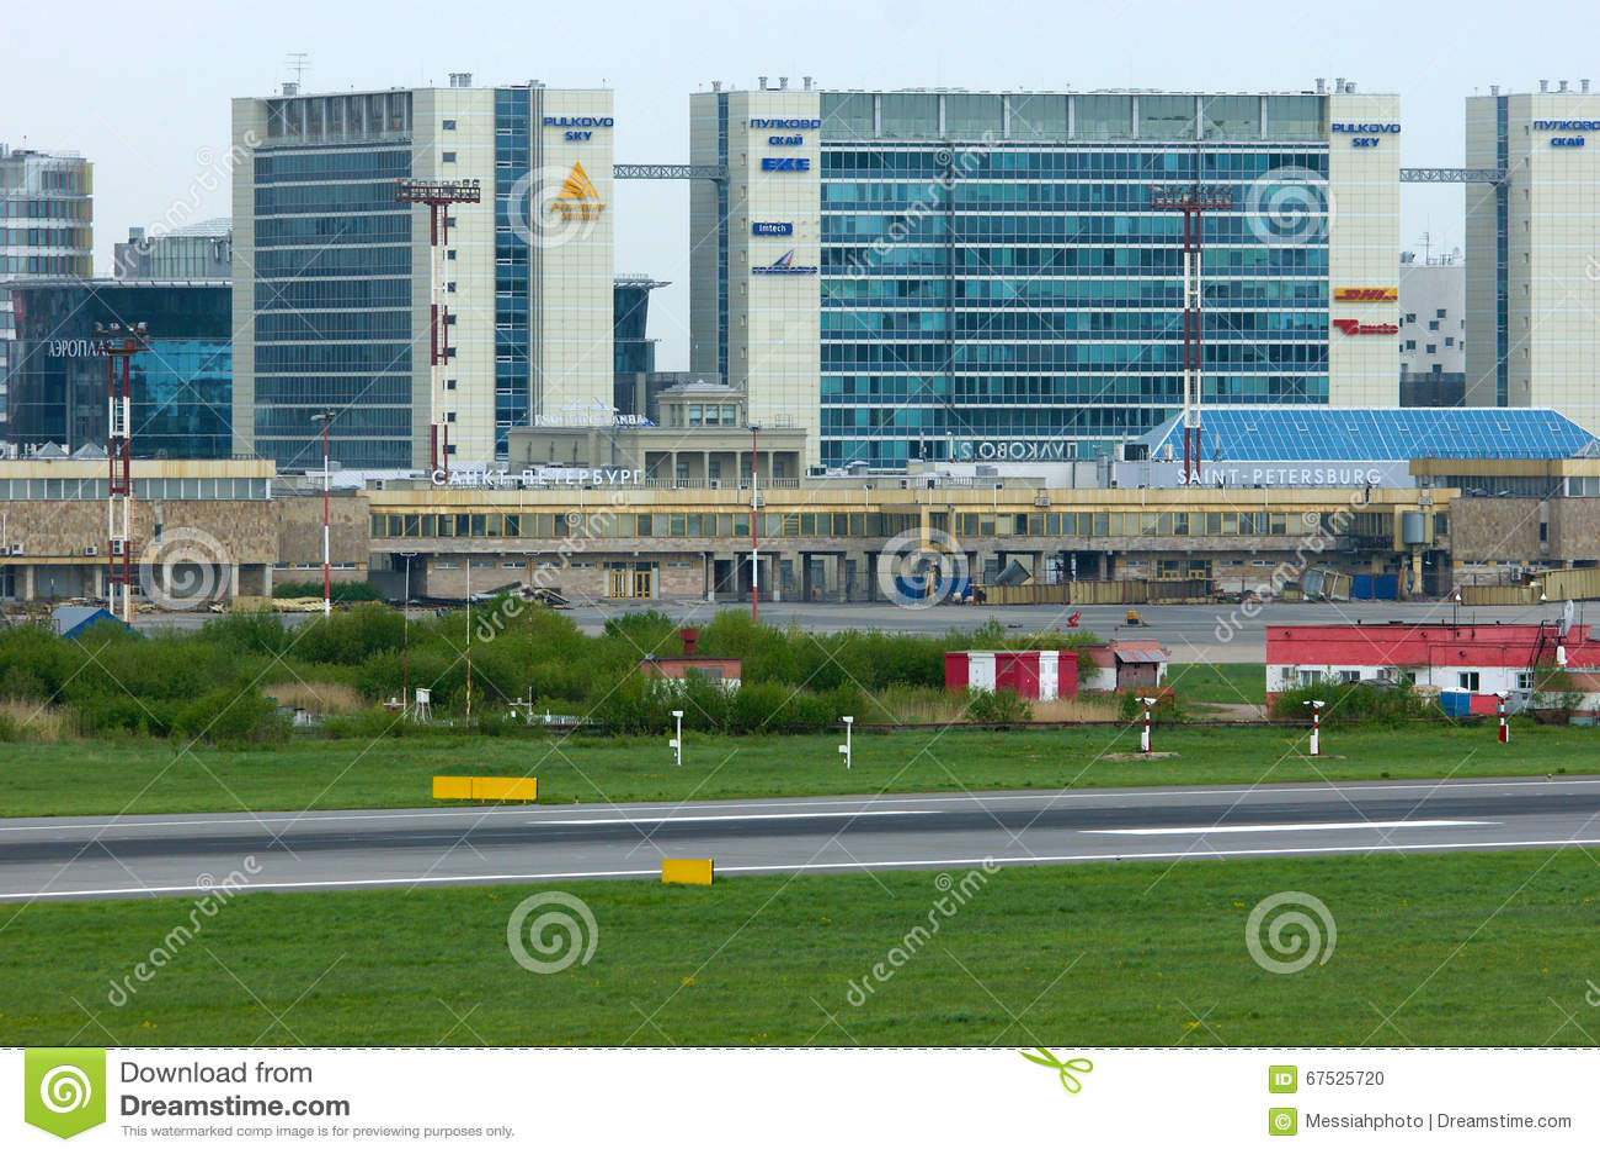 İş merkezi Pulkovo Sky: adres, fotoğraf